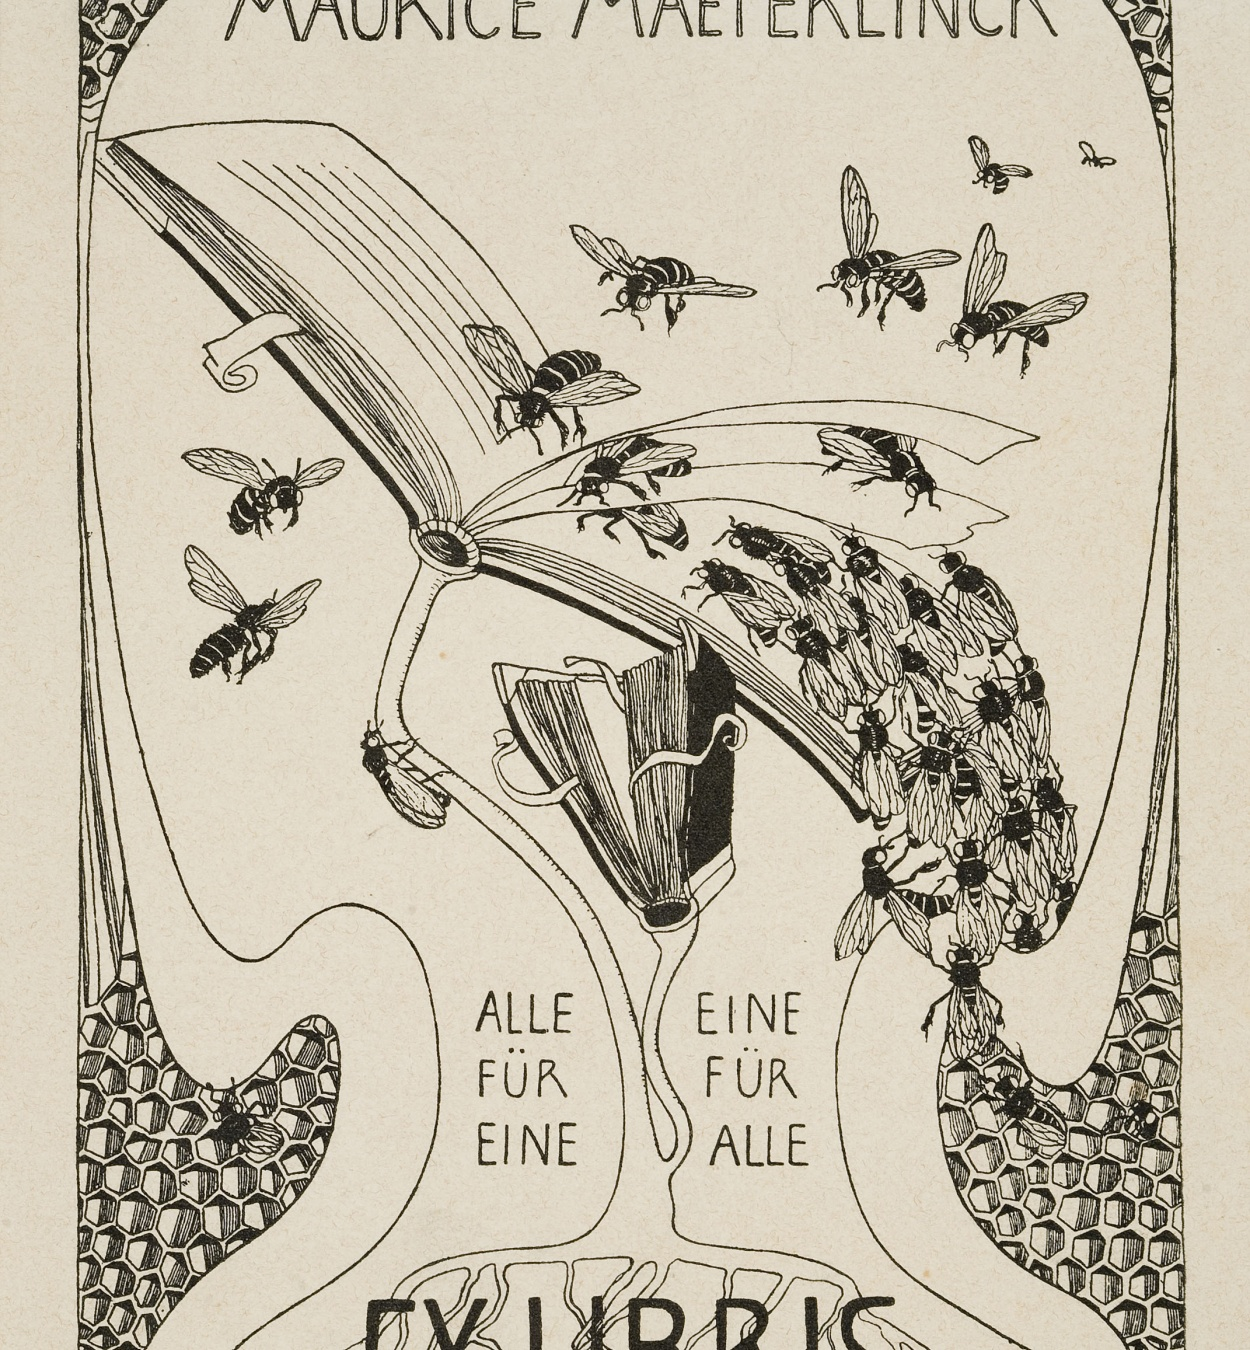 Mathilde Ade - Maurice Maeterlinck book-plate - Circa 1902